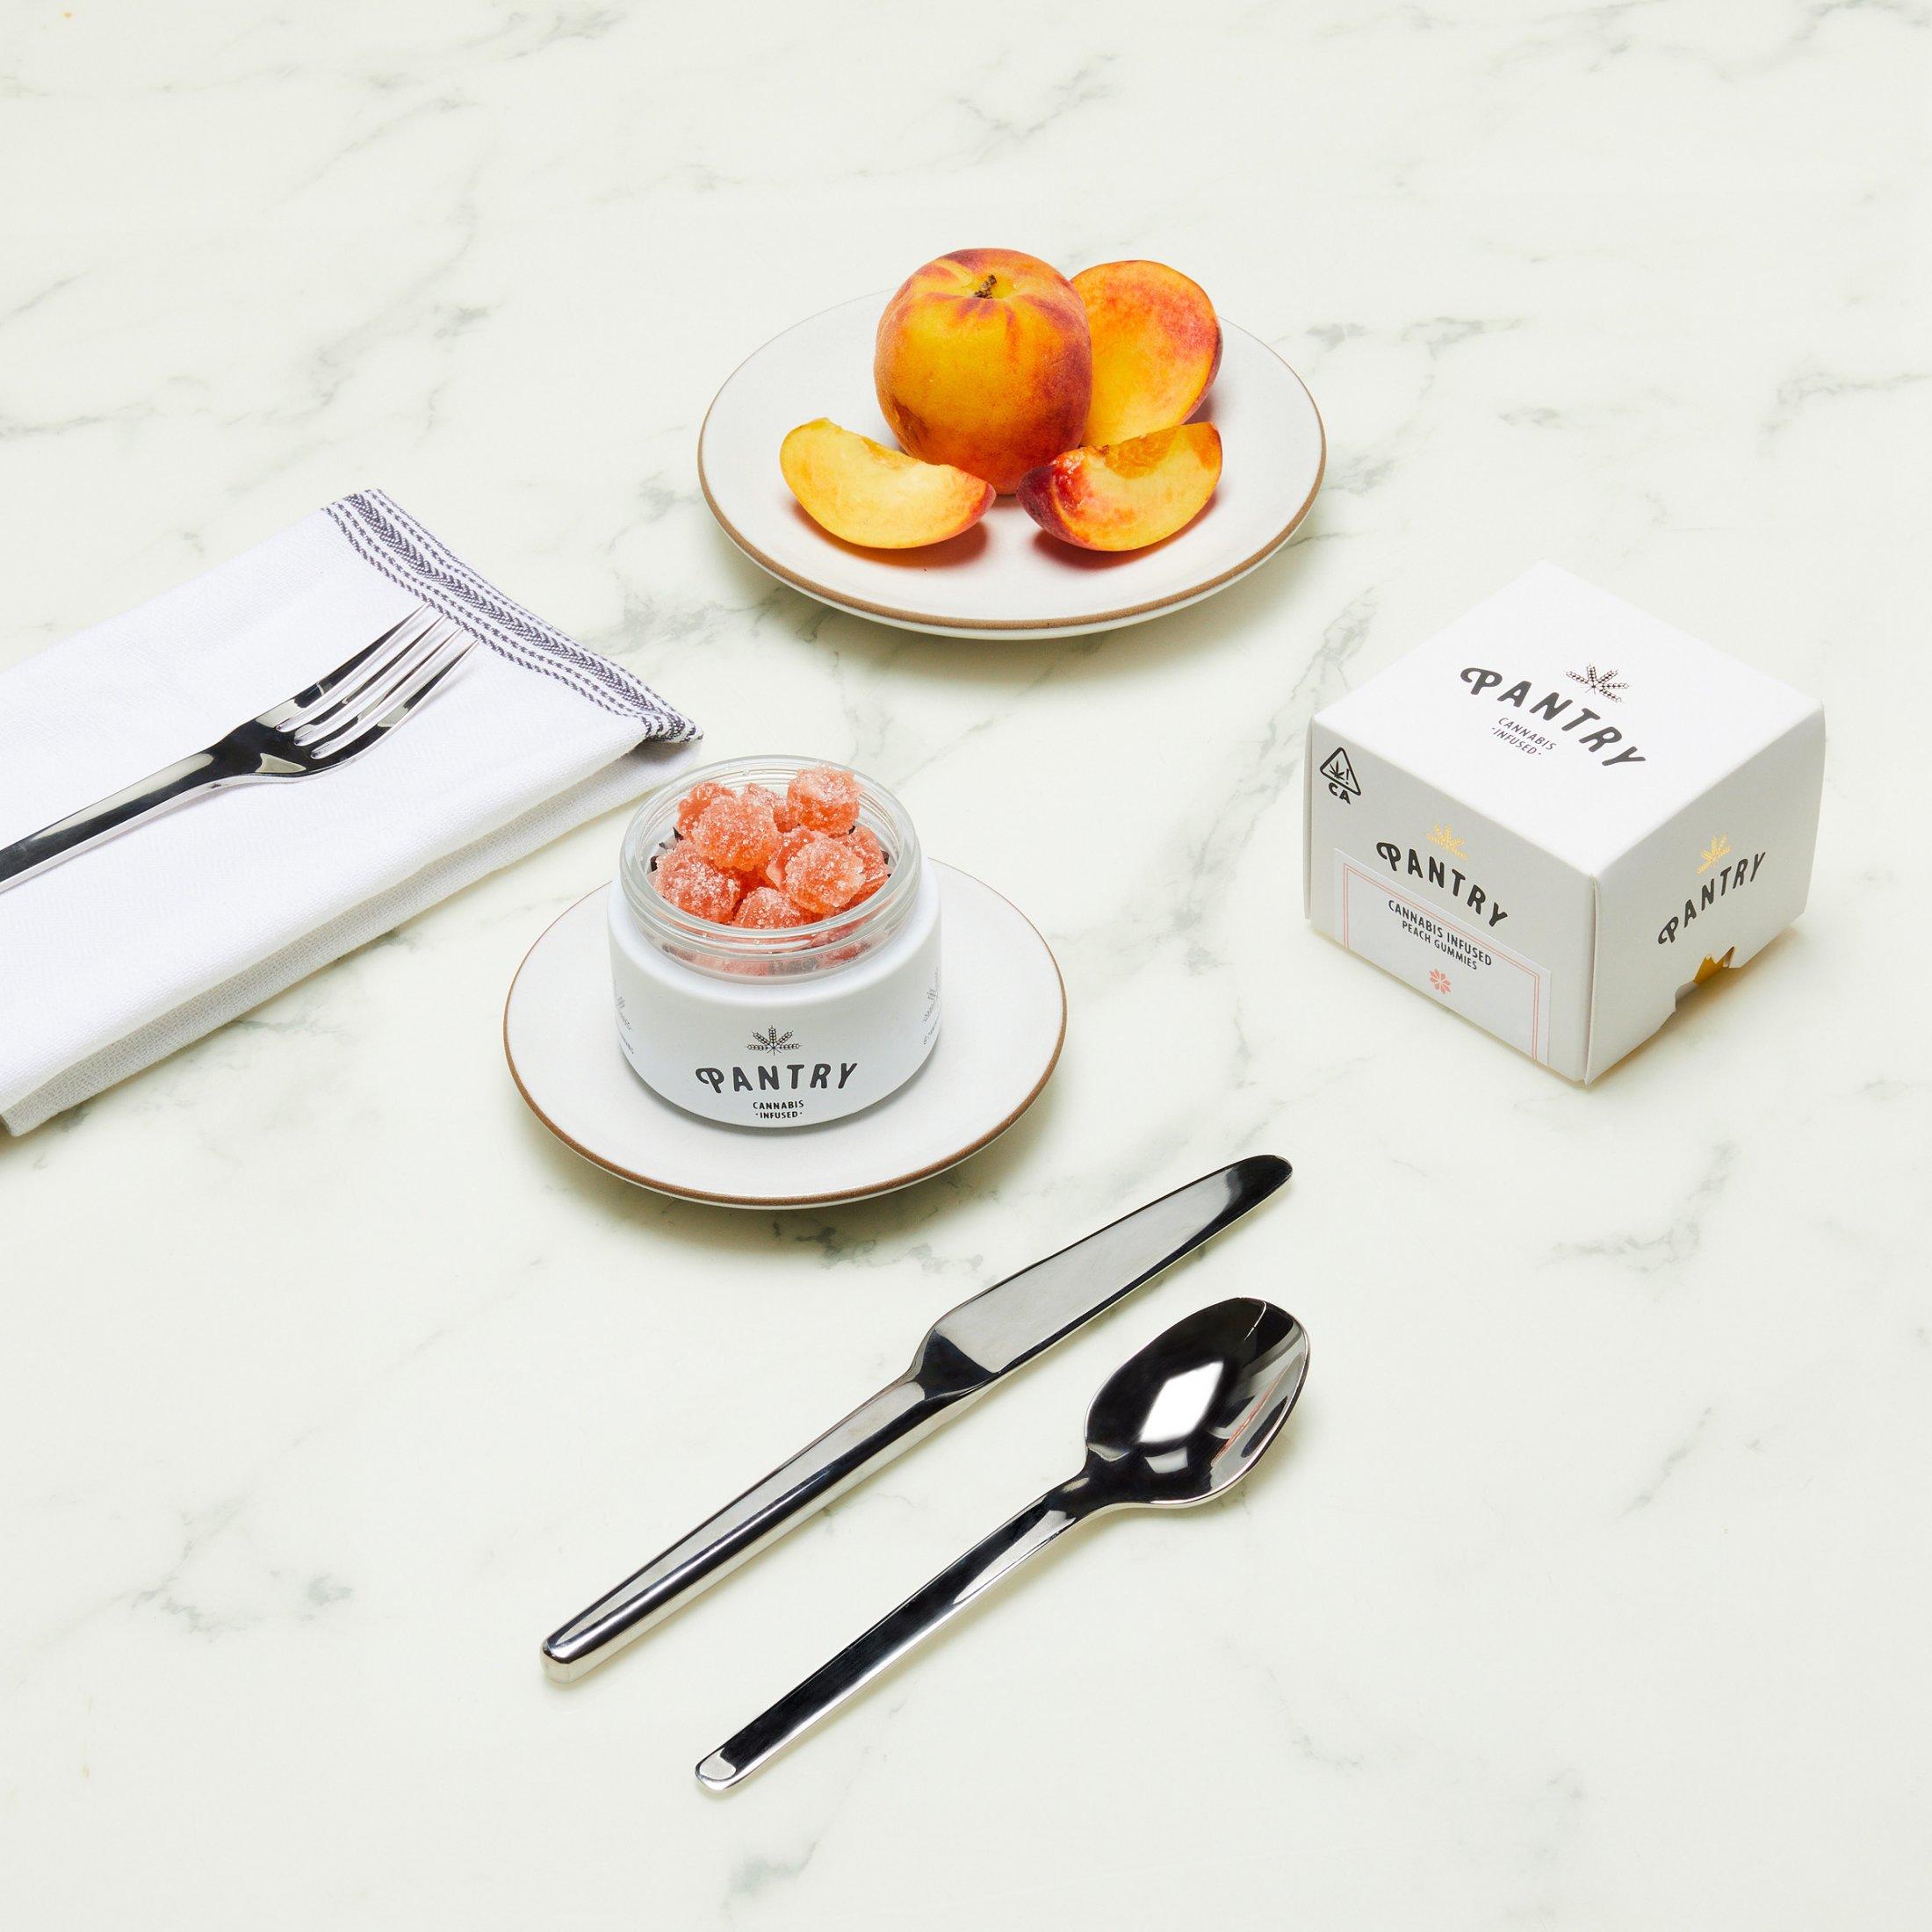 Pantry Food Co.: Pantry Food Co. Brand Development